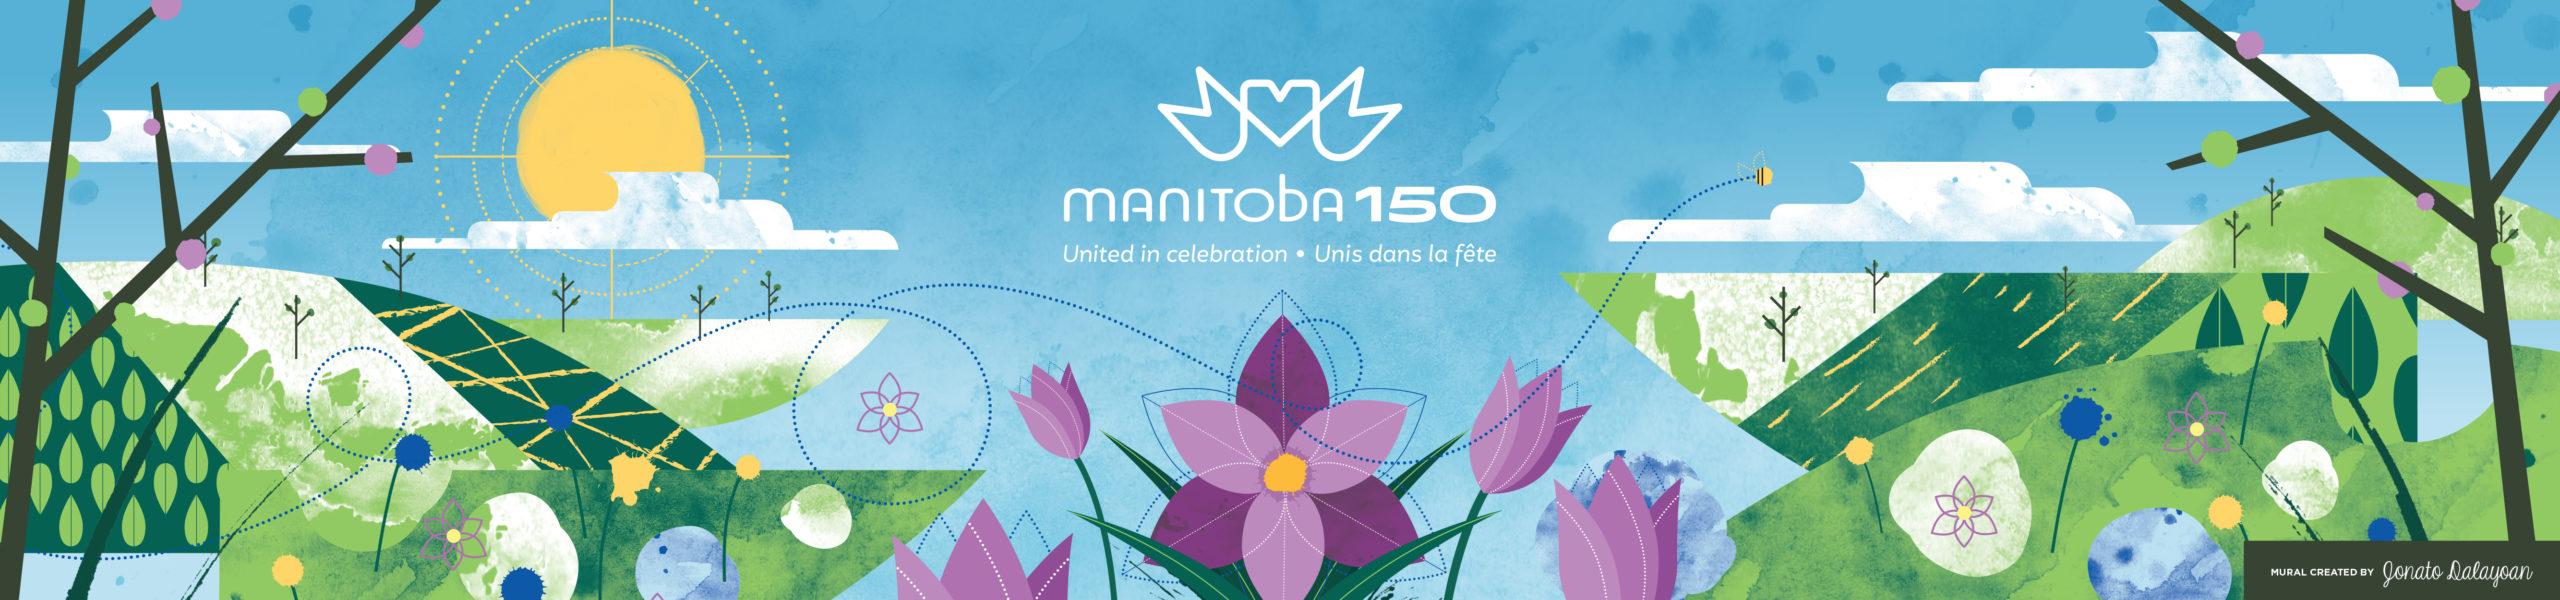 Manitoba 150 | United in celebration • Unis dans la fête